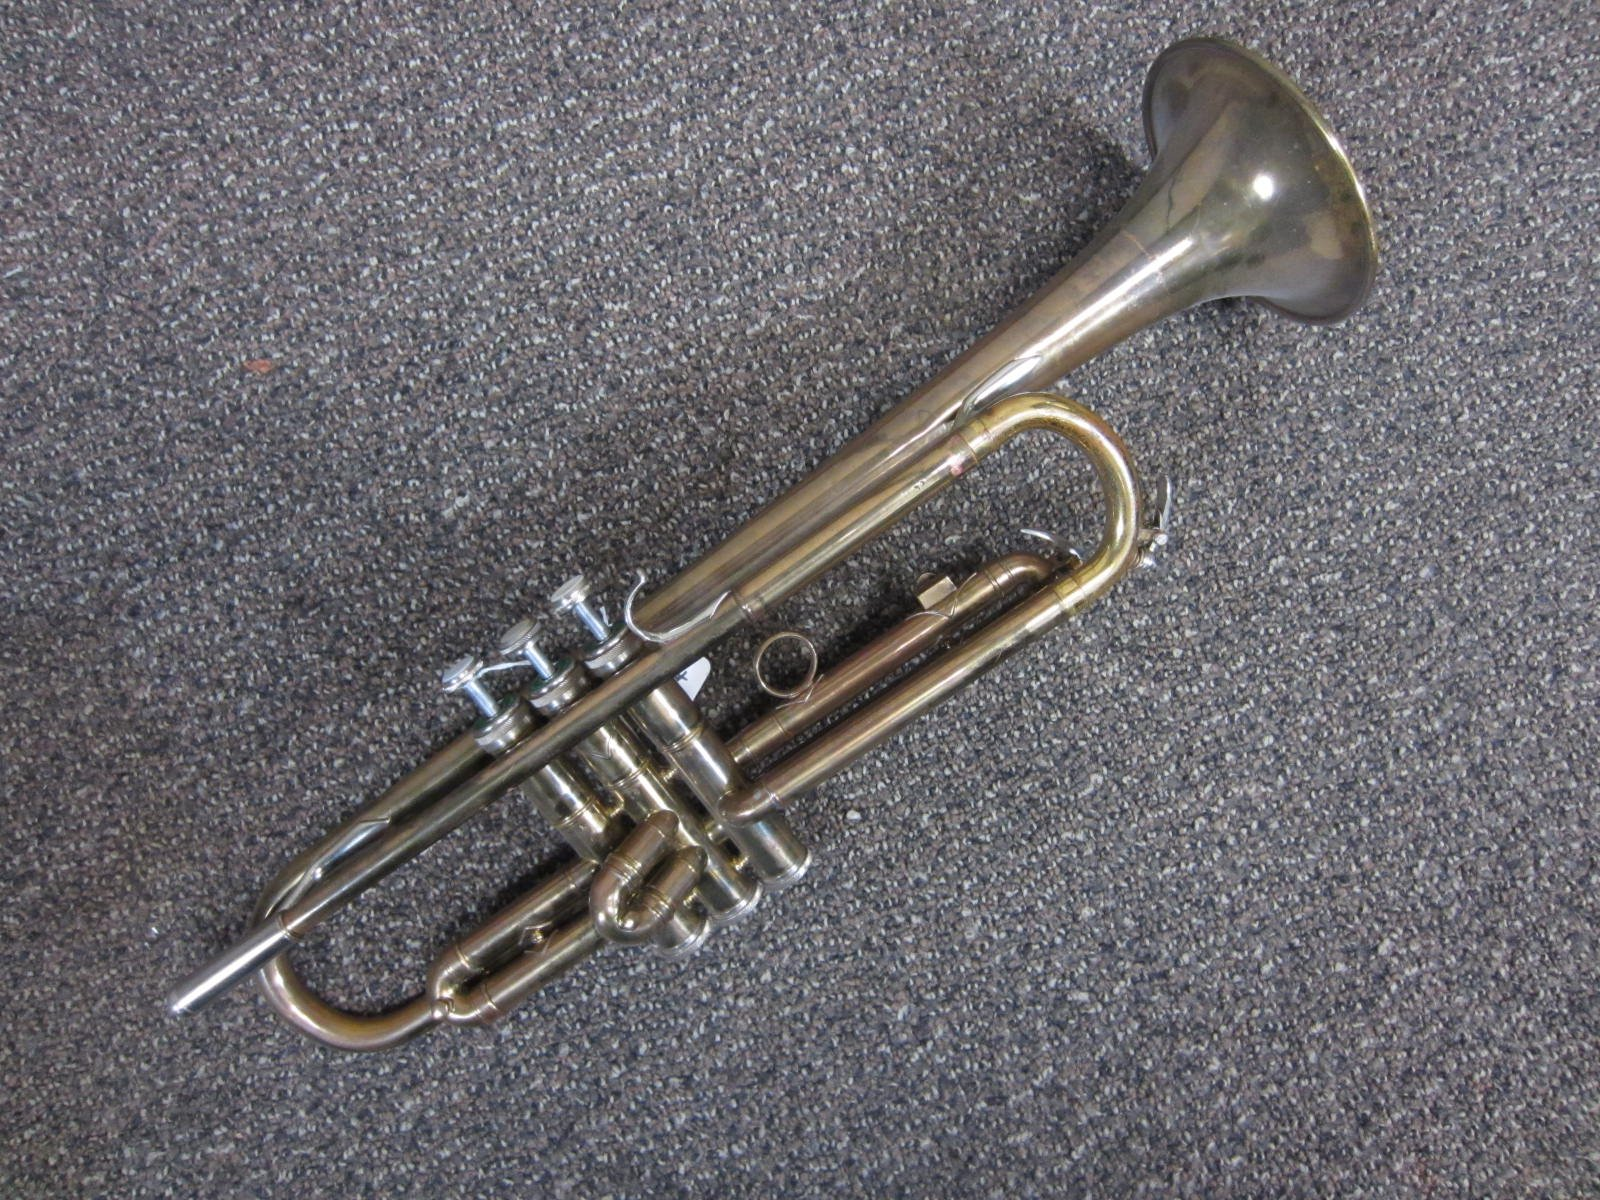 Vintage Blessing Standard Trumpet with Case